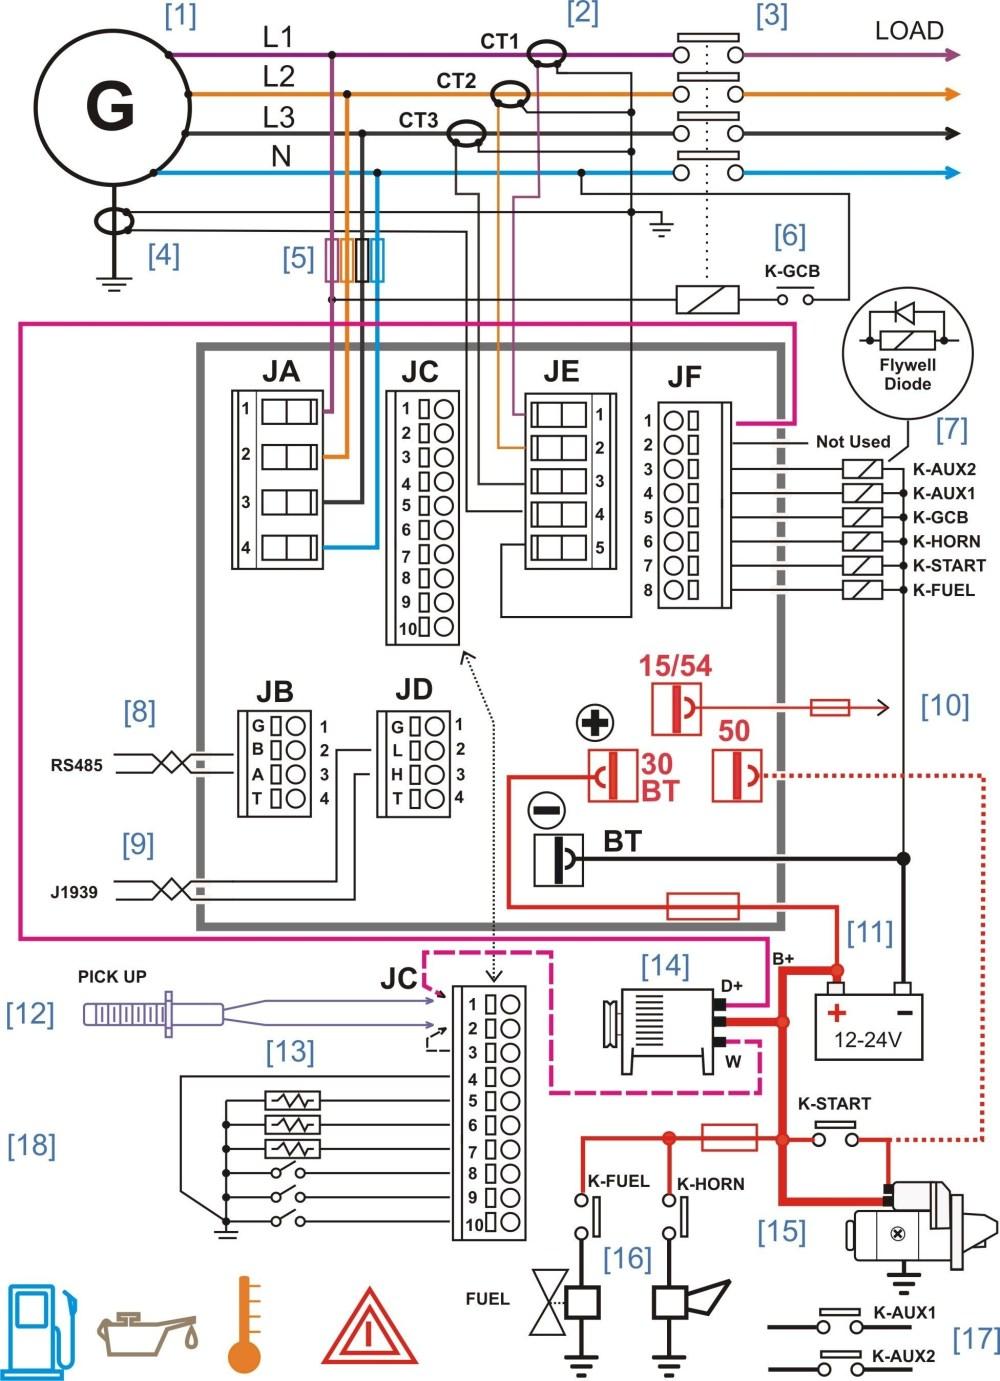 medium resolution of lighting control panel wiring diagram wiring diagram for wolf generator best diesel generator control panel